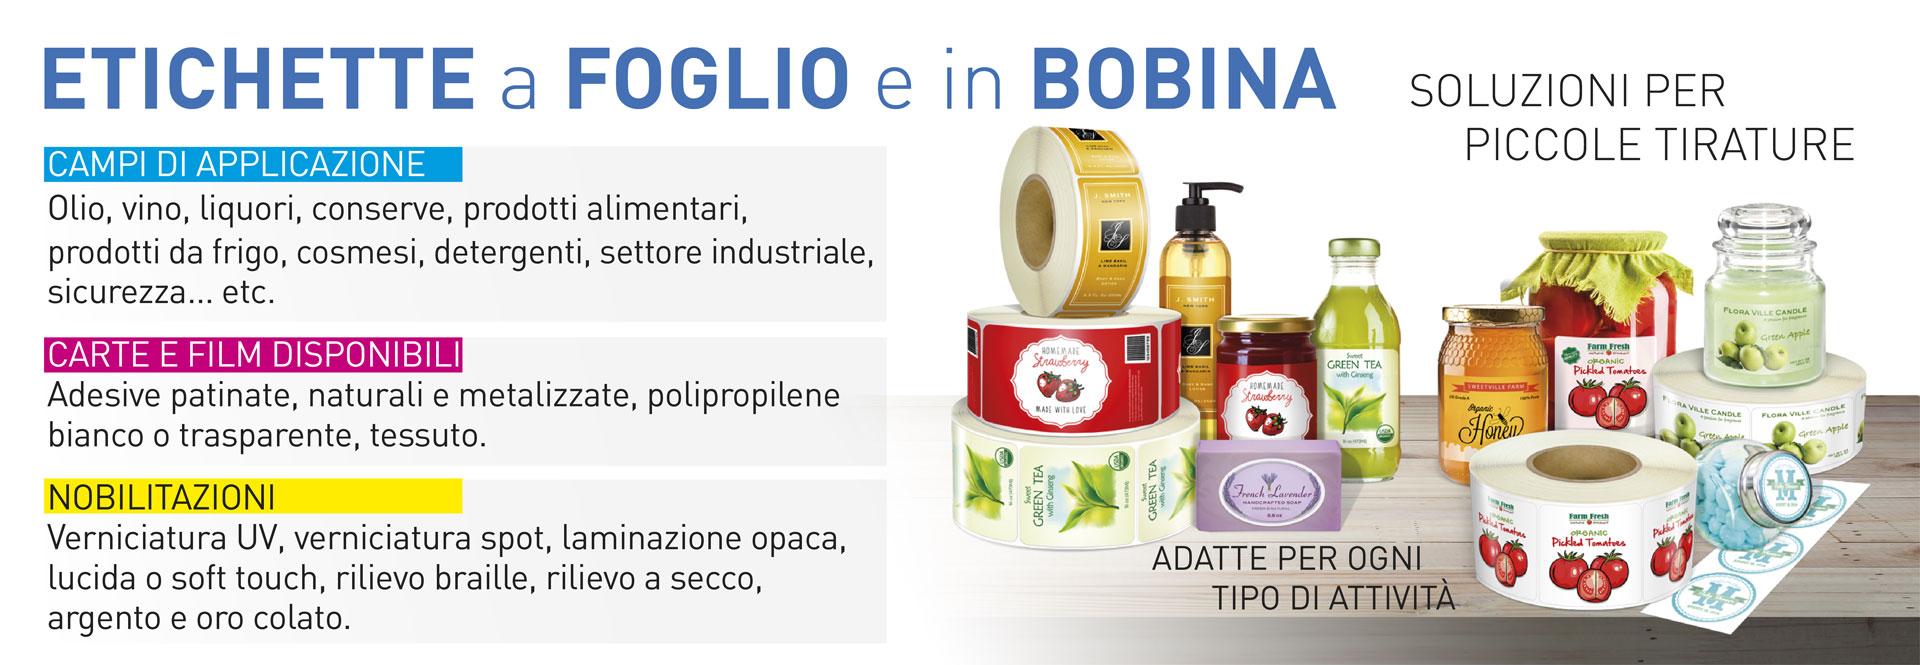 slide_etichetteinbobina